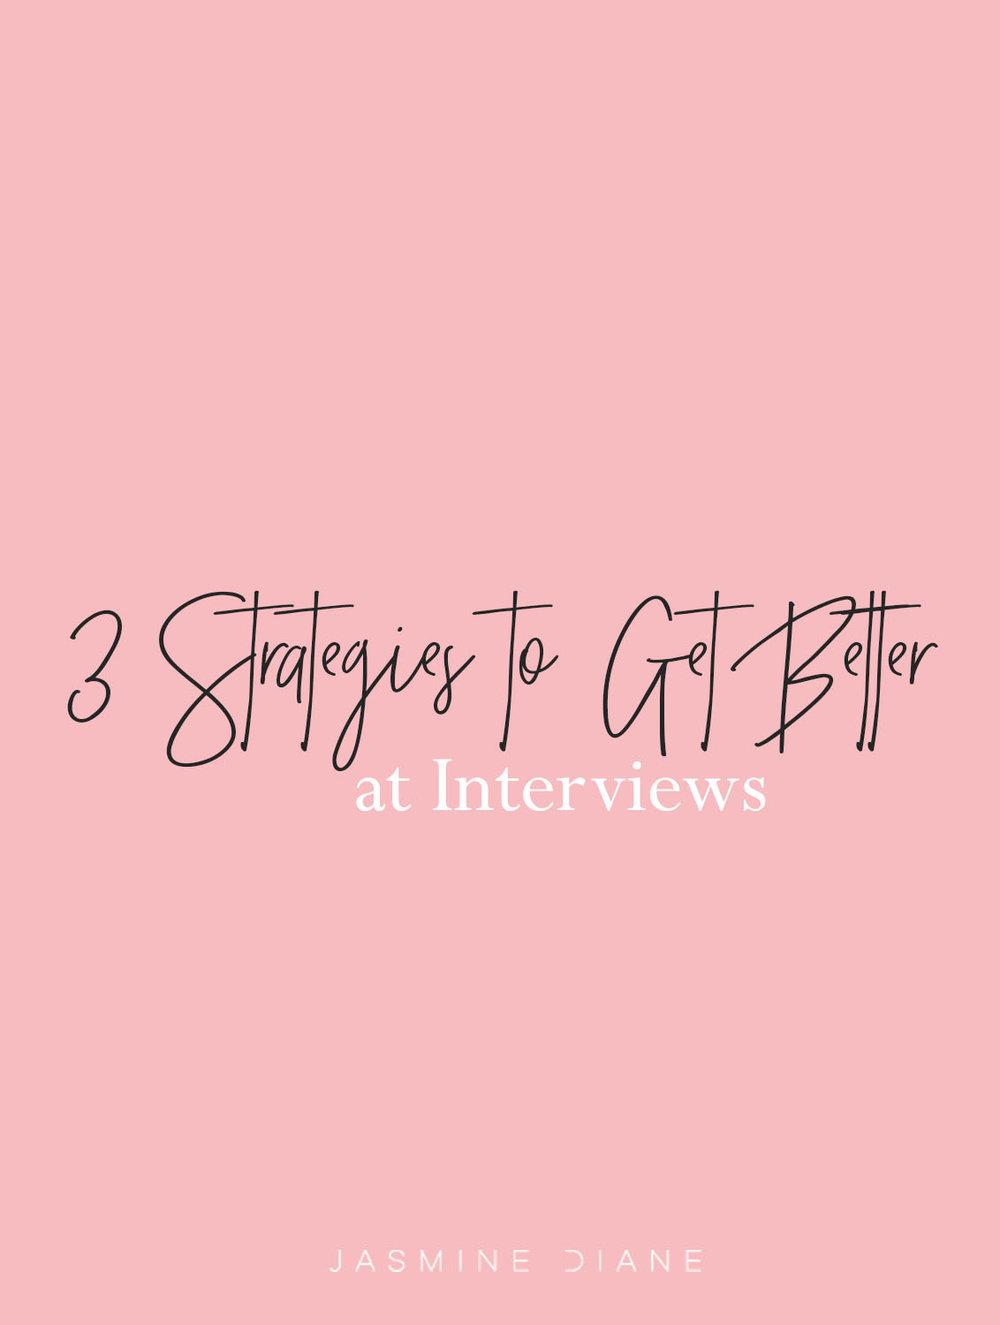 3 strategies to get better at interviews by jasmine diane